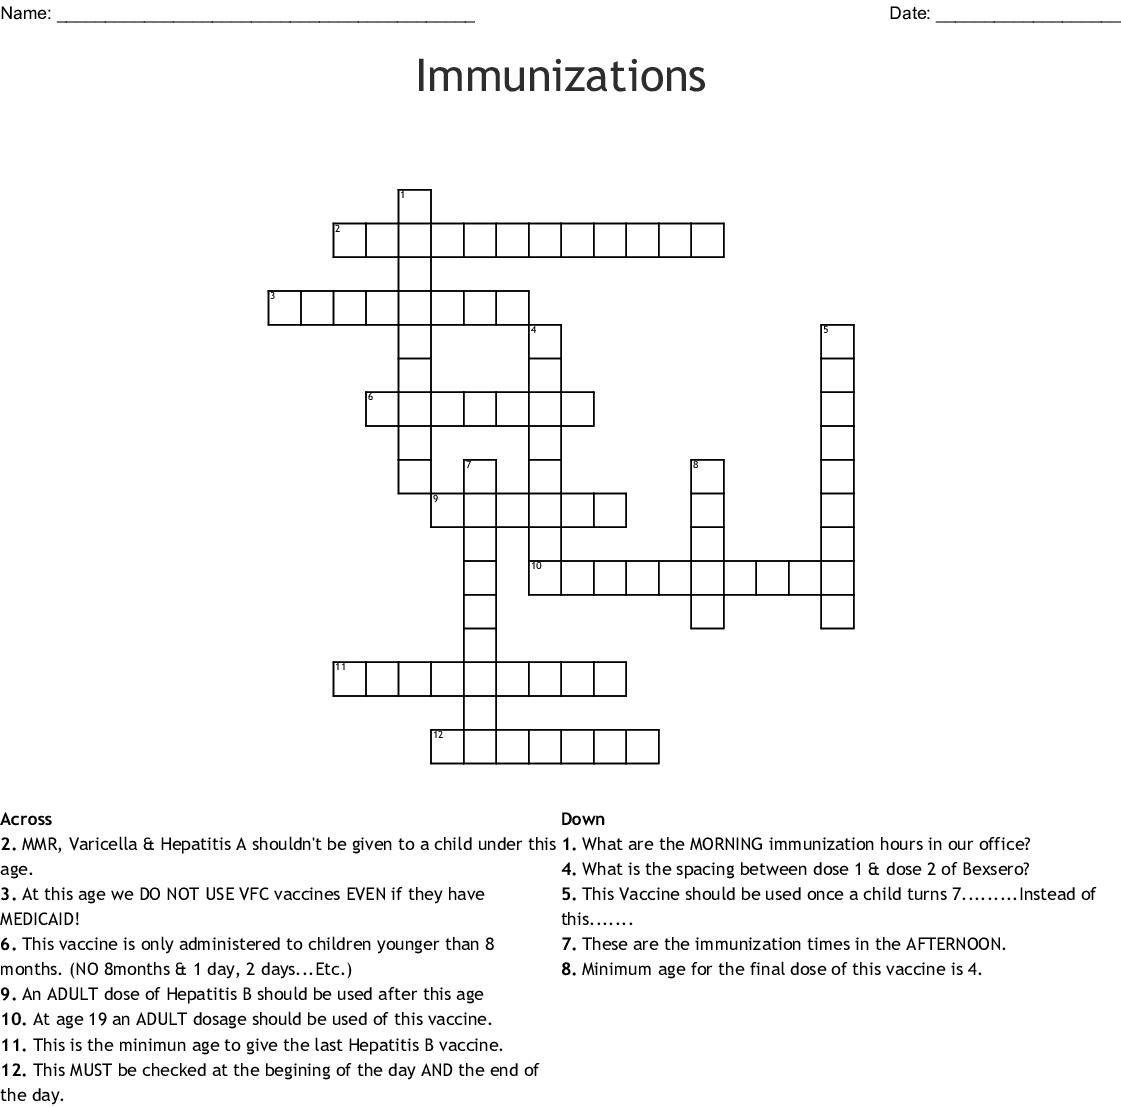 Immunizations Crossword